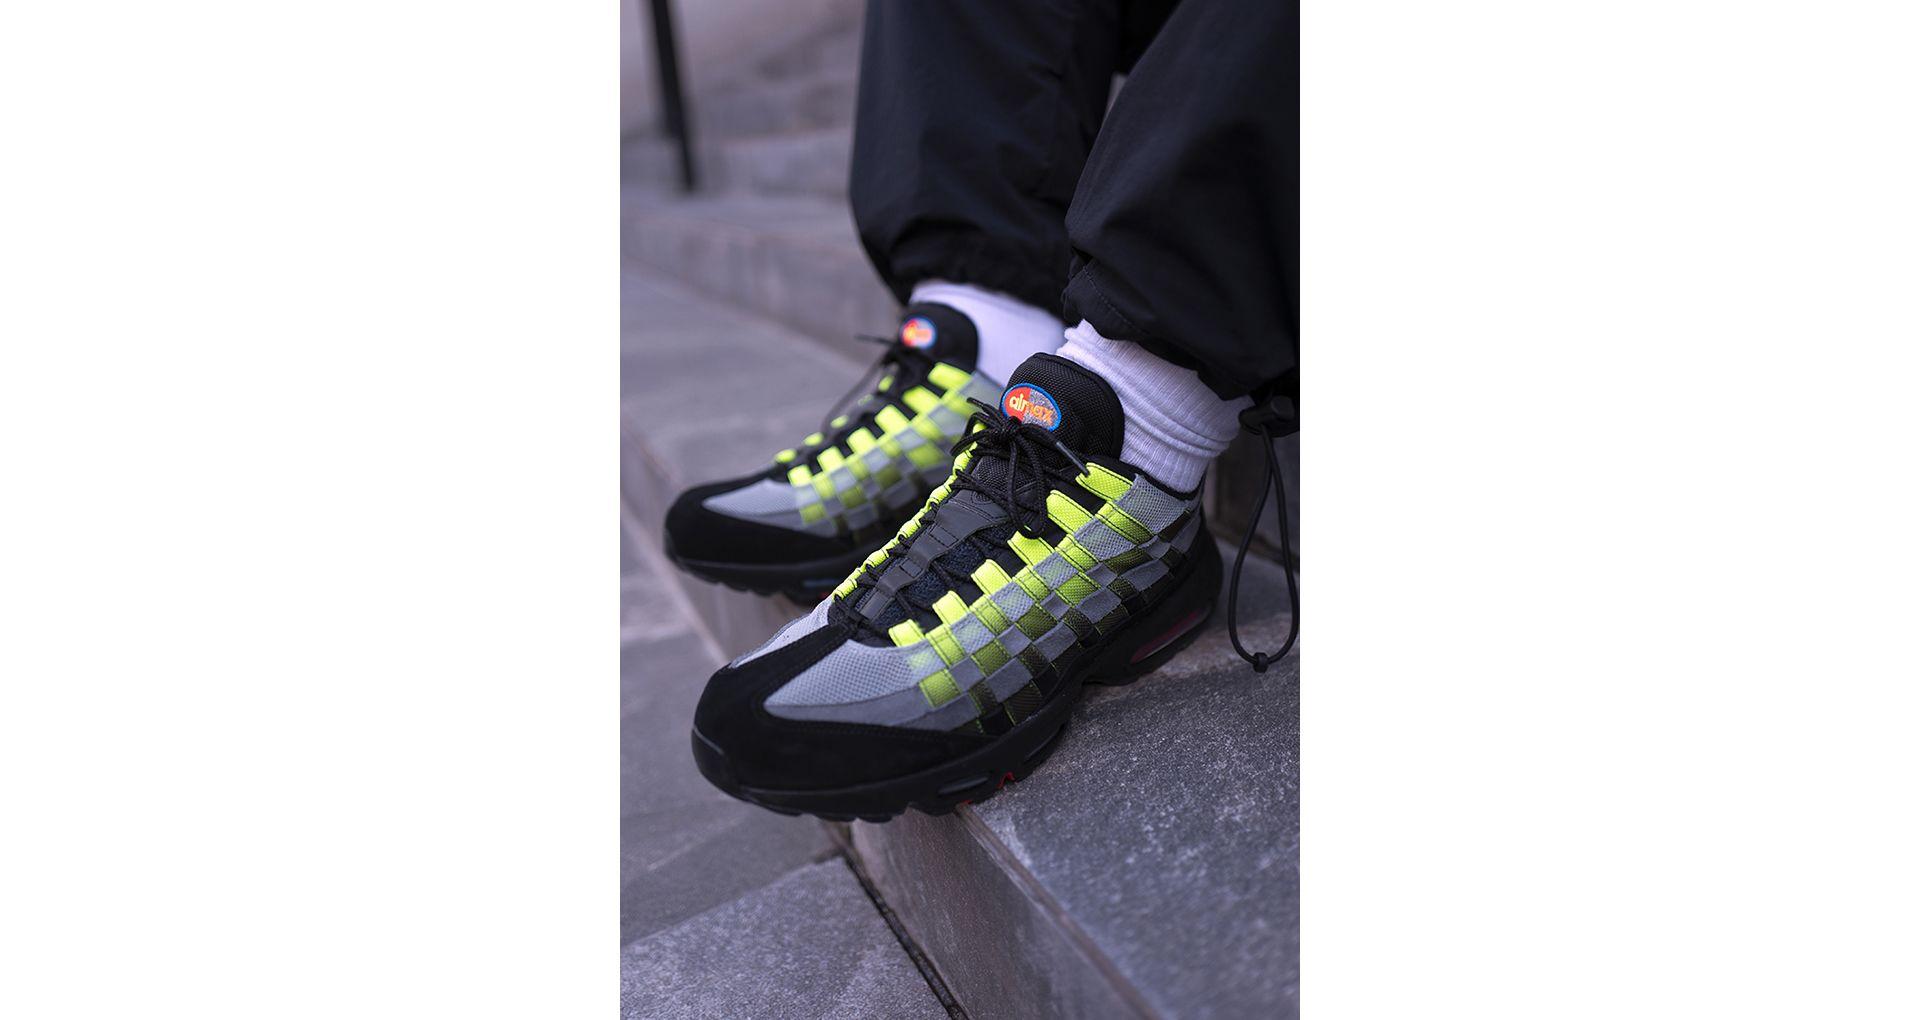 City Gear Blog This Week's Heat: Nike Air Max 95 SE, Nike